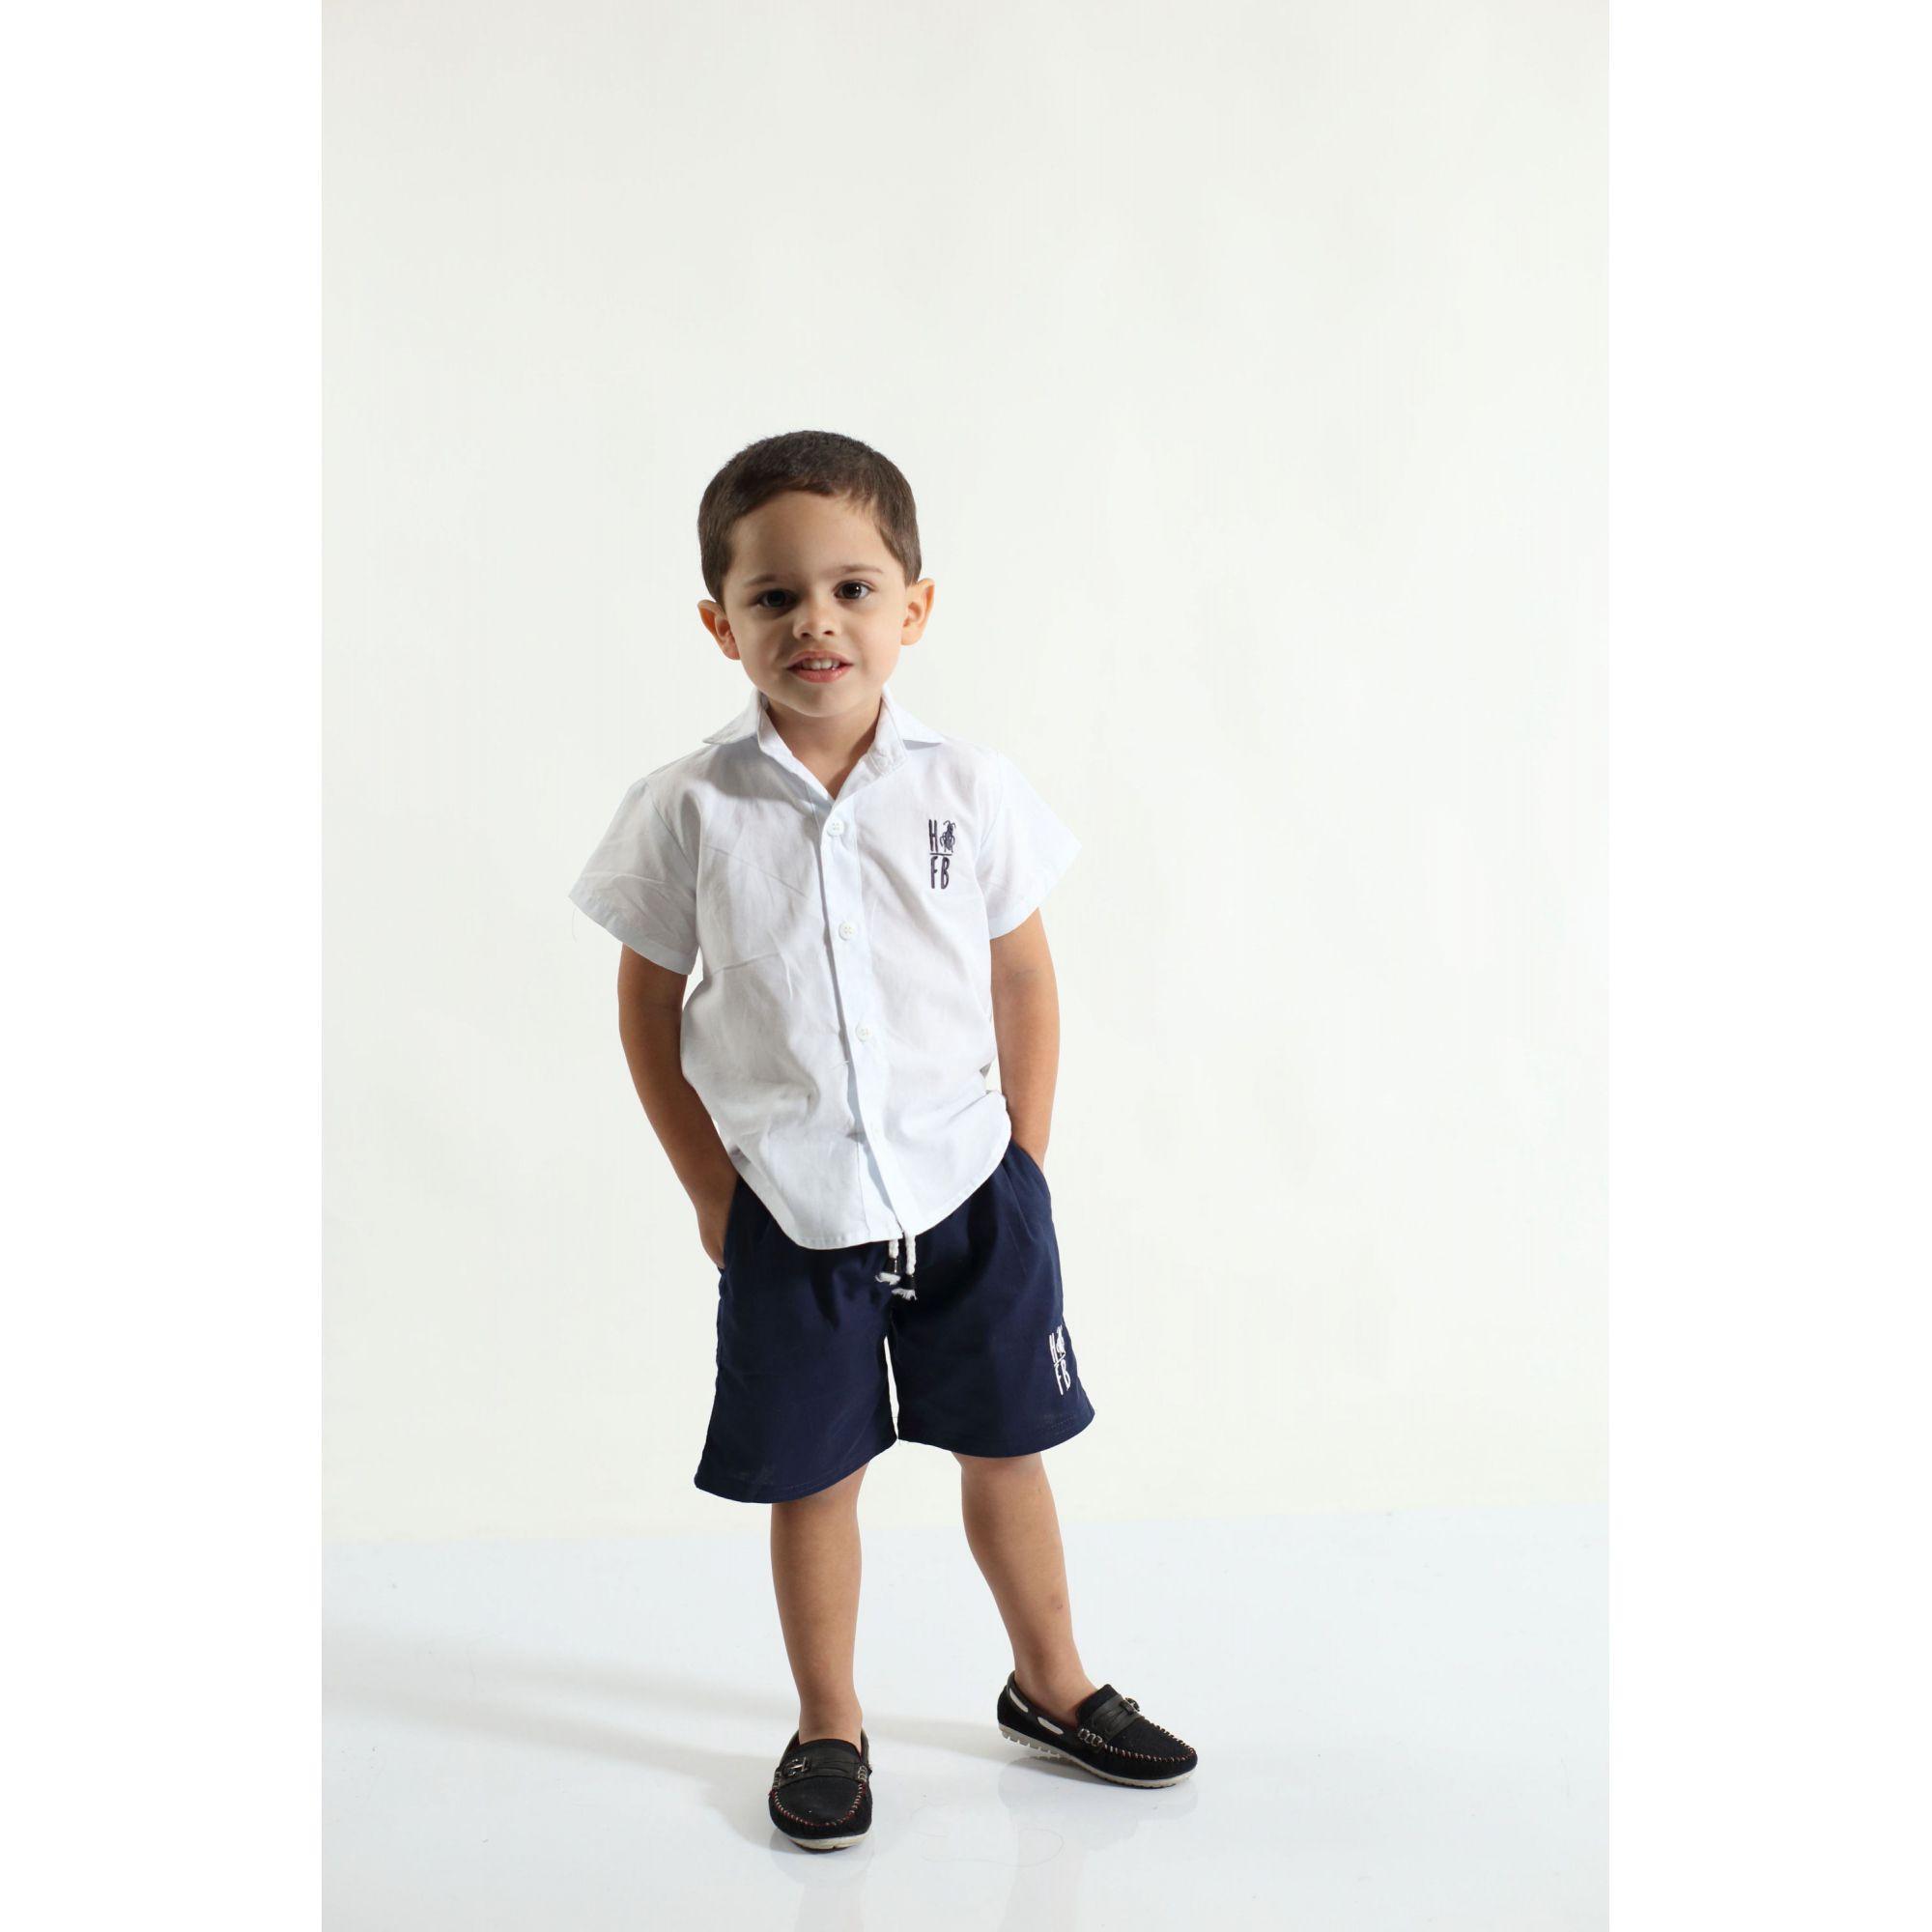 Camisa Social Manga Curta Branca Infantil  - Heitor Fashion Brazil